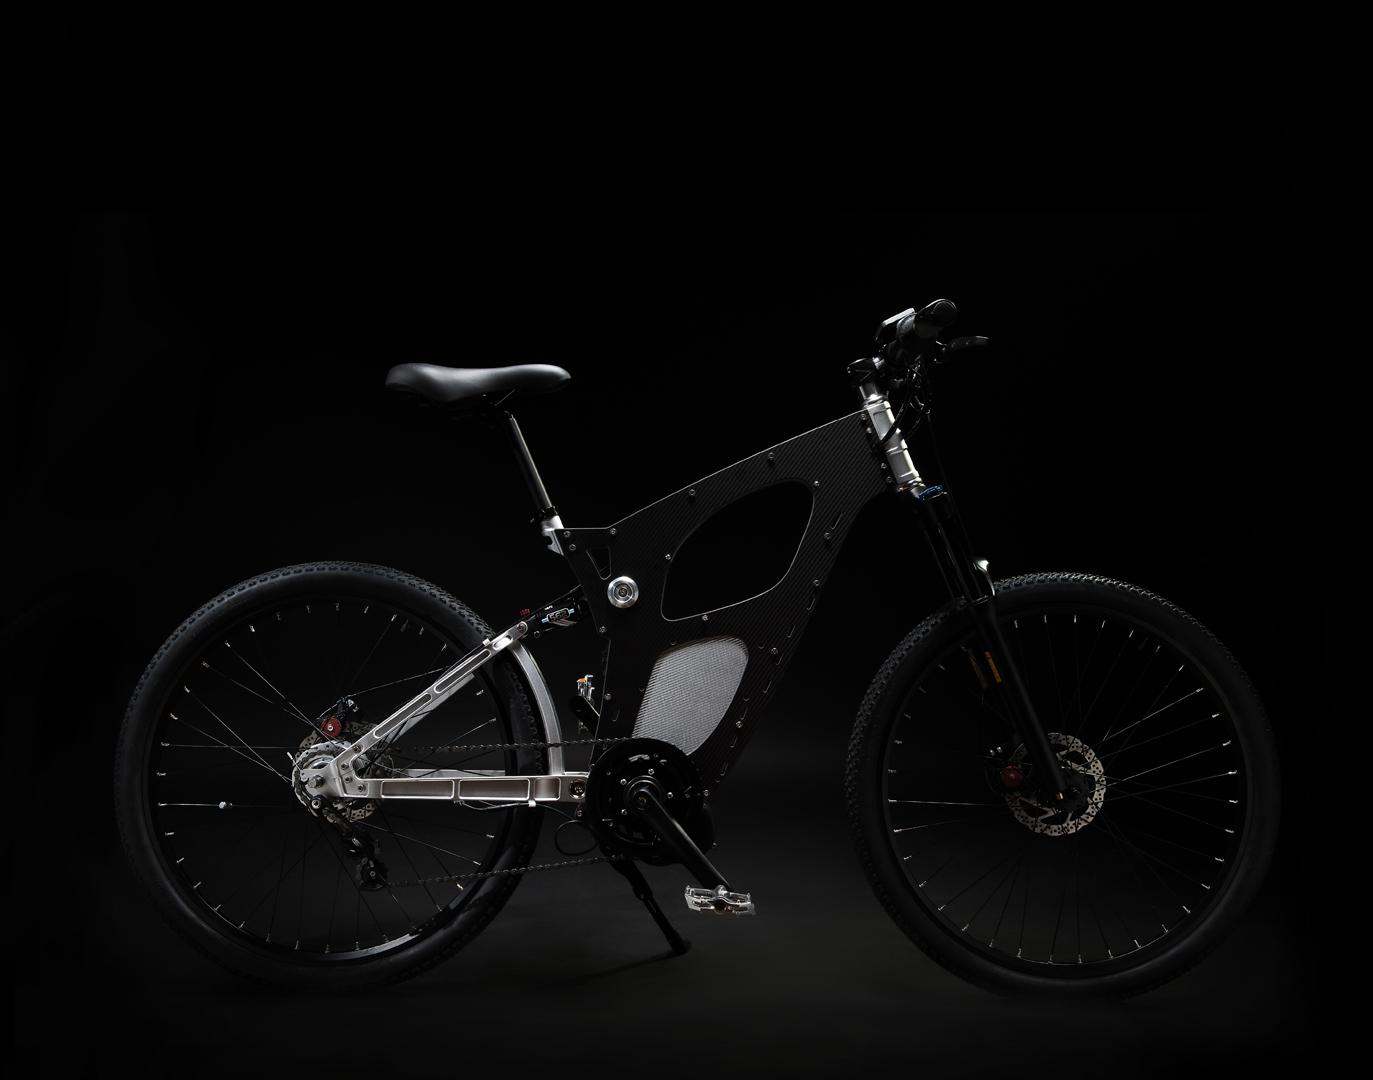 STERKA M1 E-bike or E-bike kit / It is up to you to choose